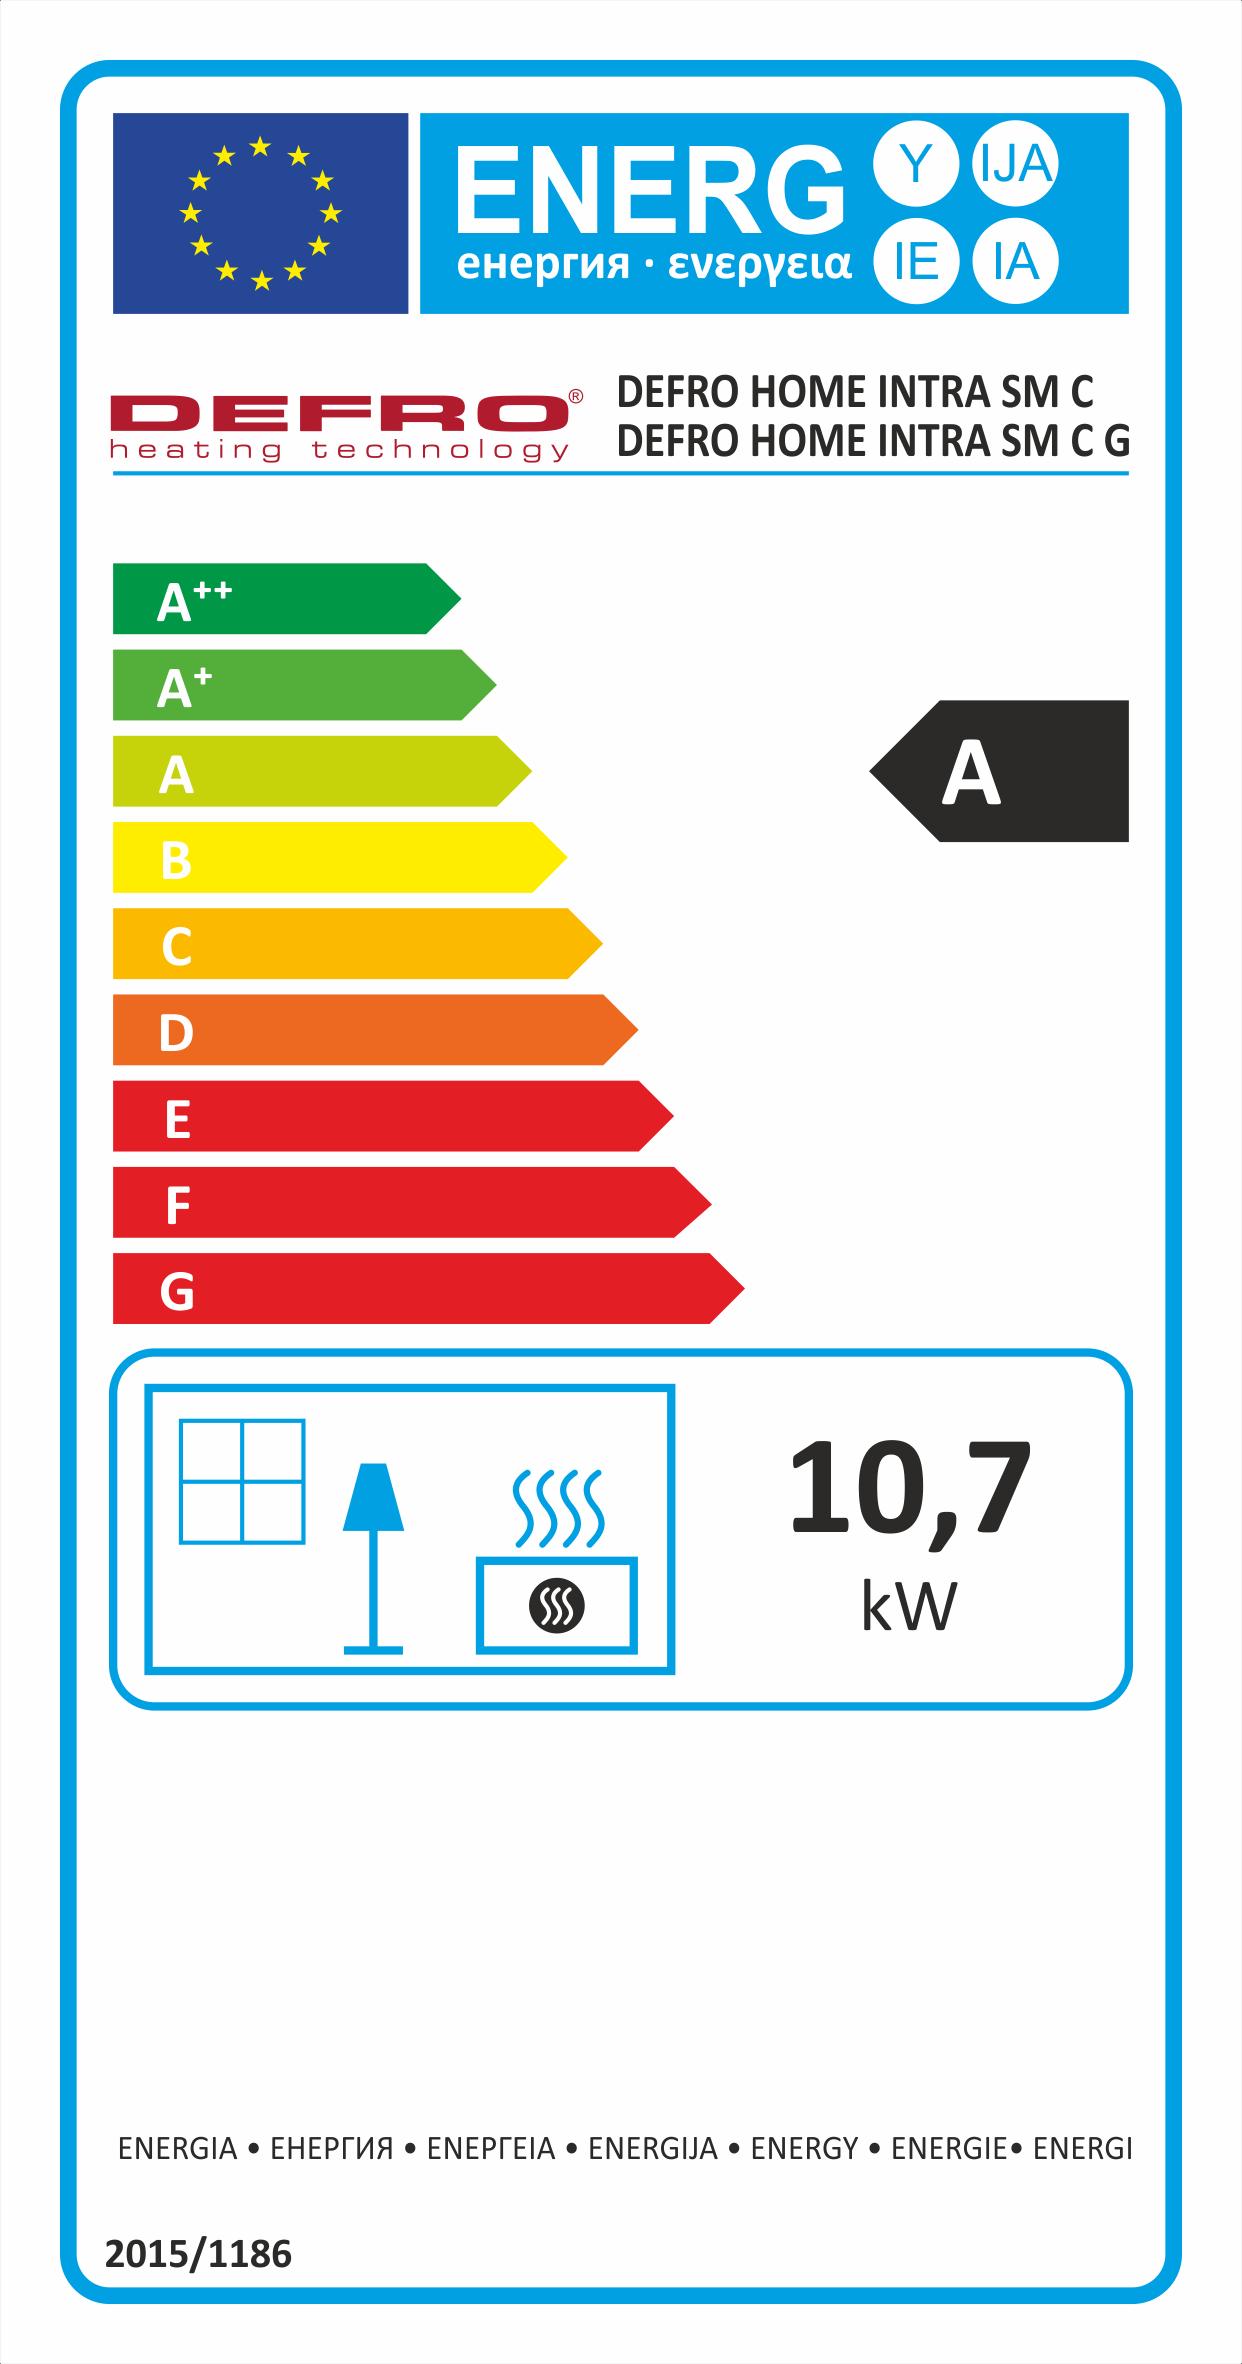 Defro Home Intra SM C energeticky stitok krbyonline